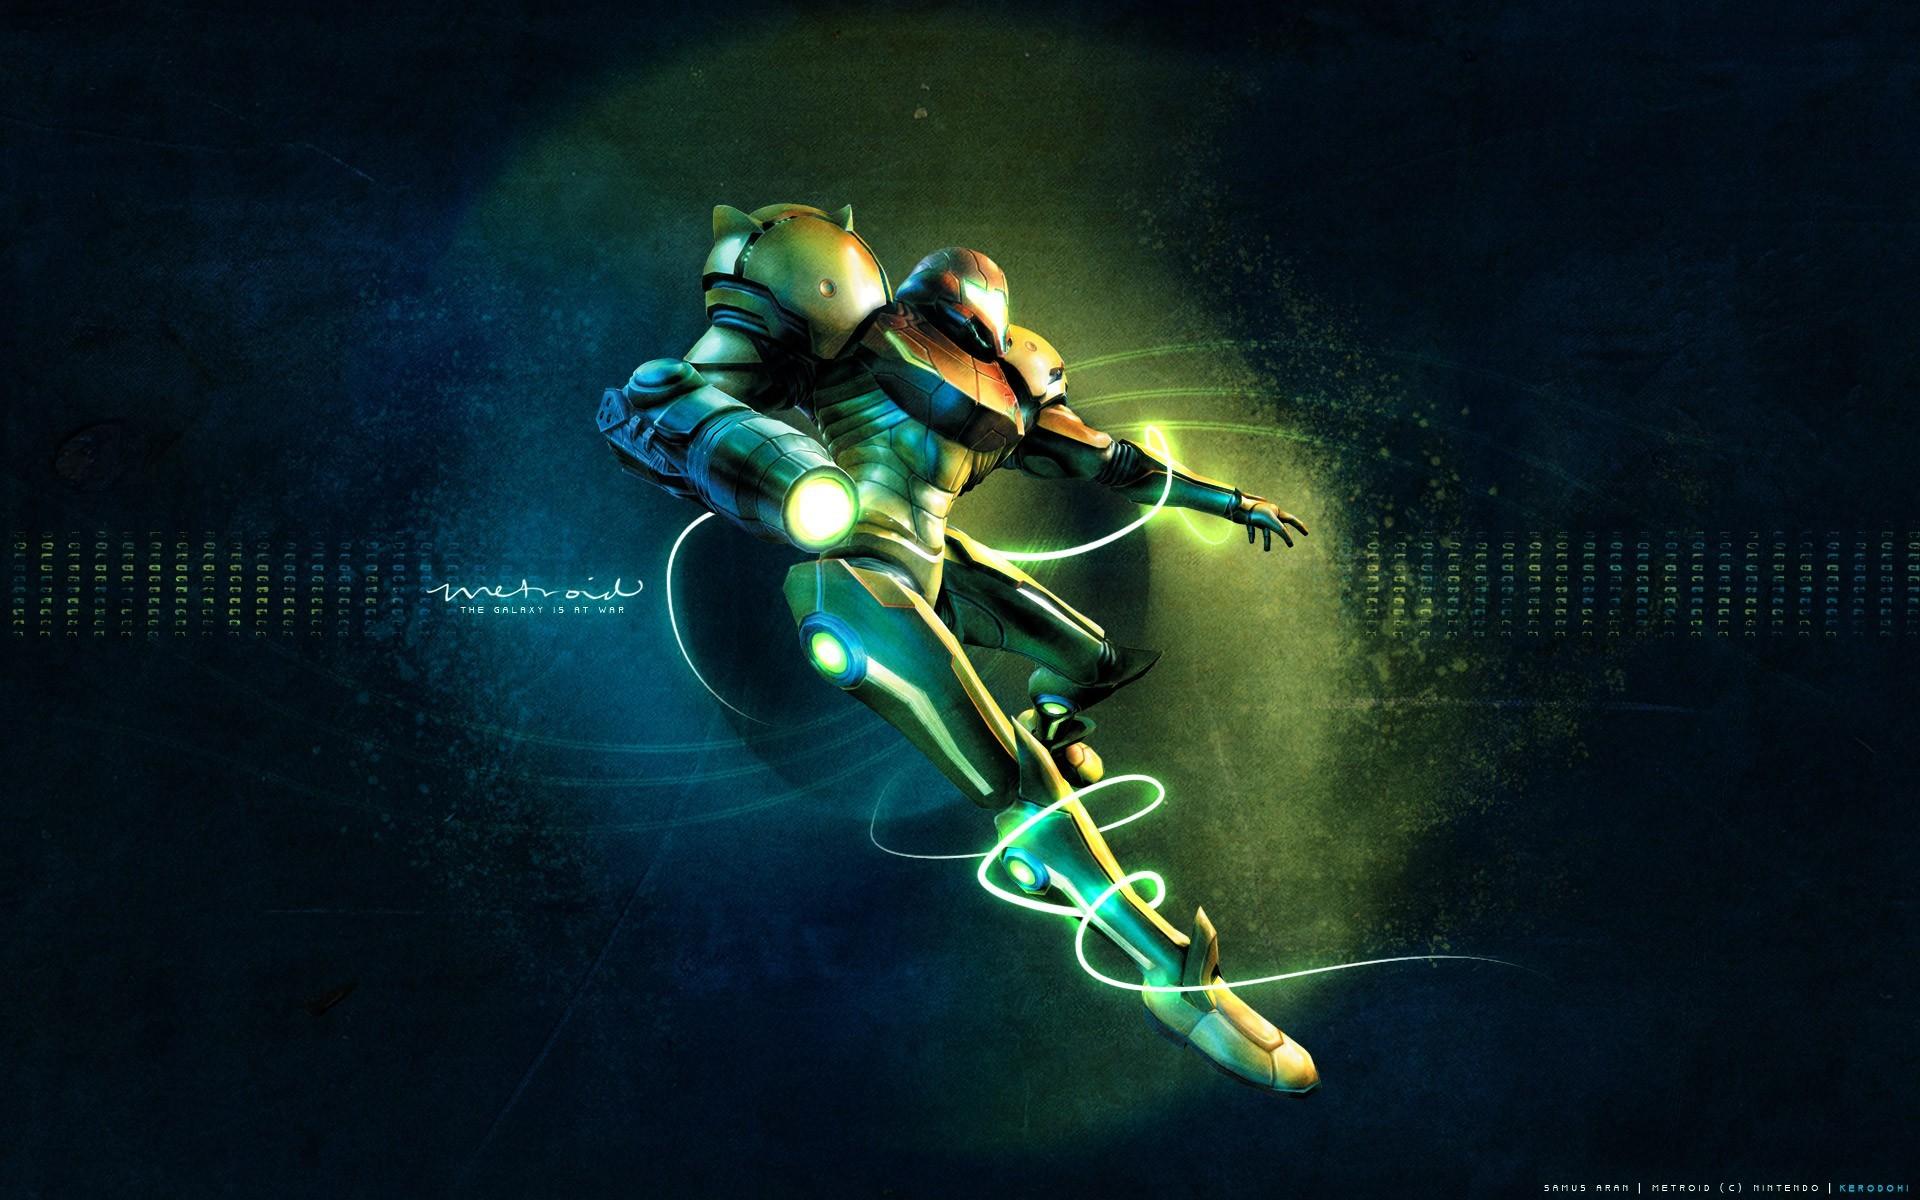 Metroid Video Wallpaper Metroid, Video, Games, Minimalistic .